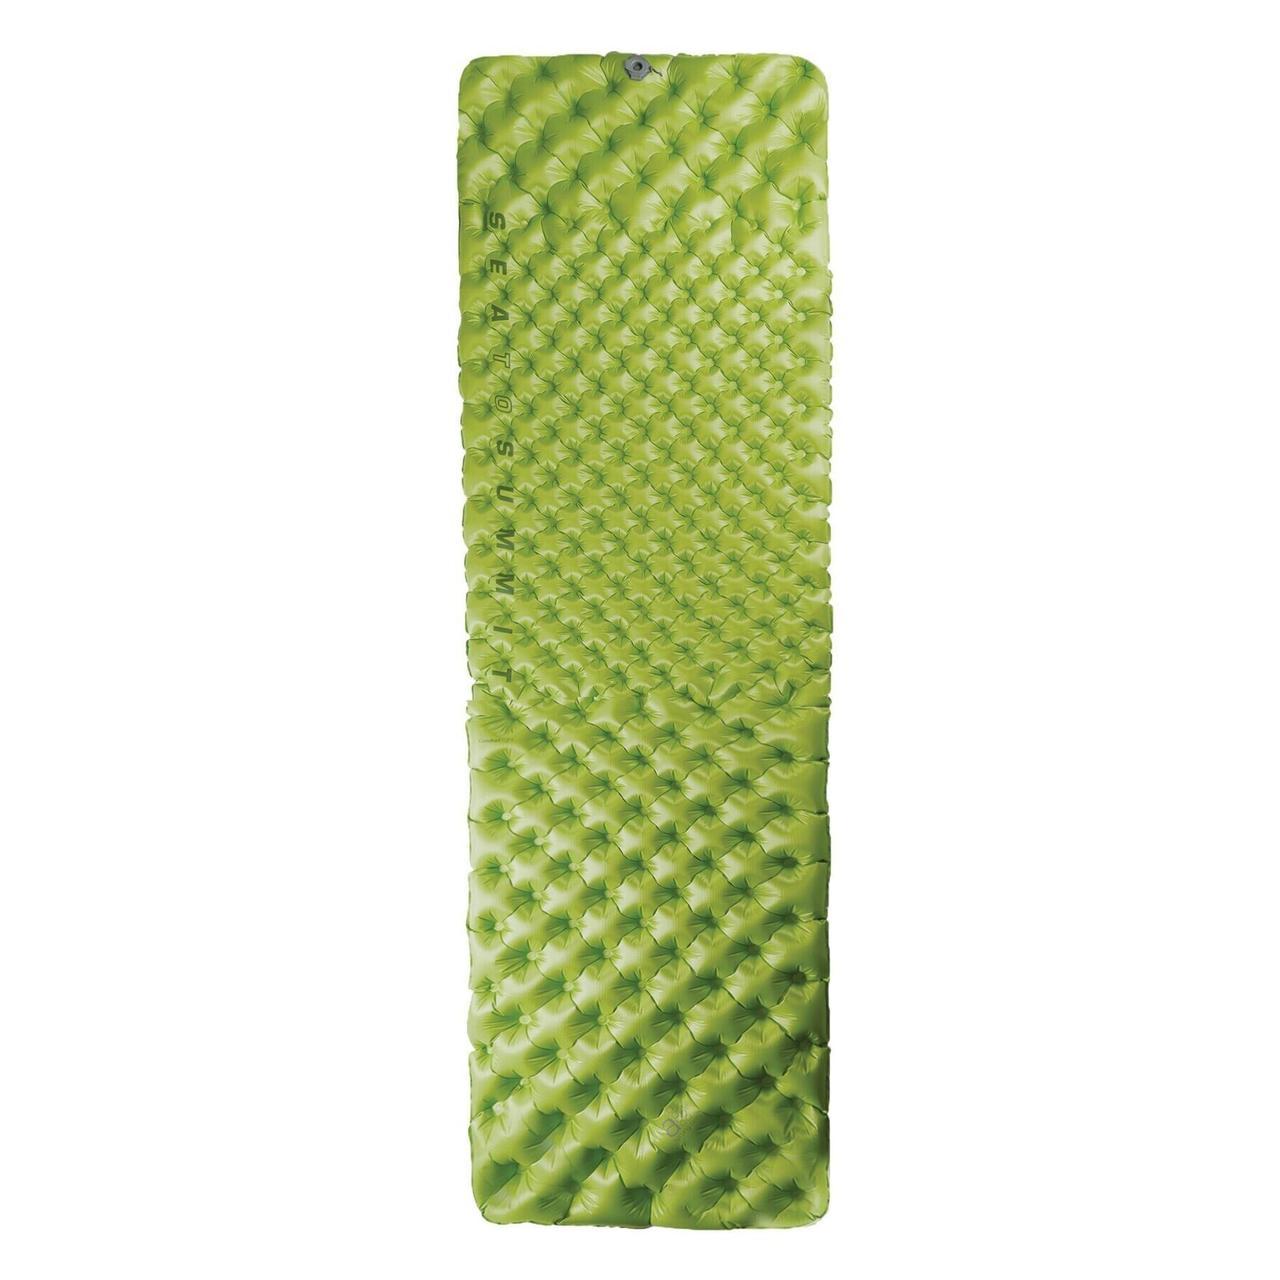 Надувний килимок Sea To Summit Air Sprung Comfort Light Insulated Mat 2020 Green Regular Rectangular